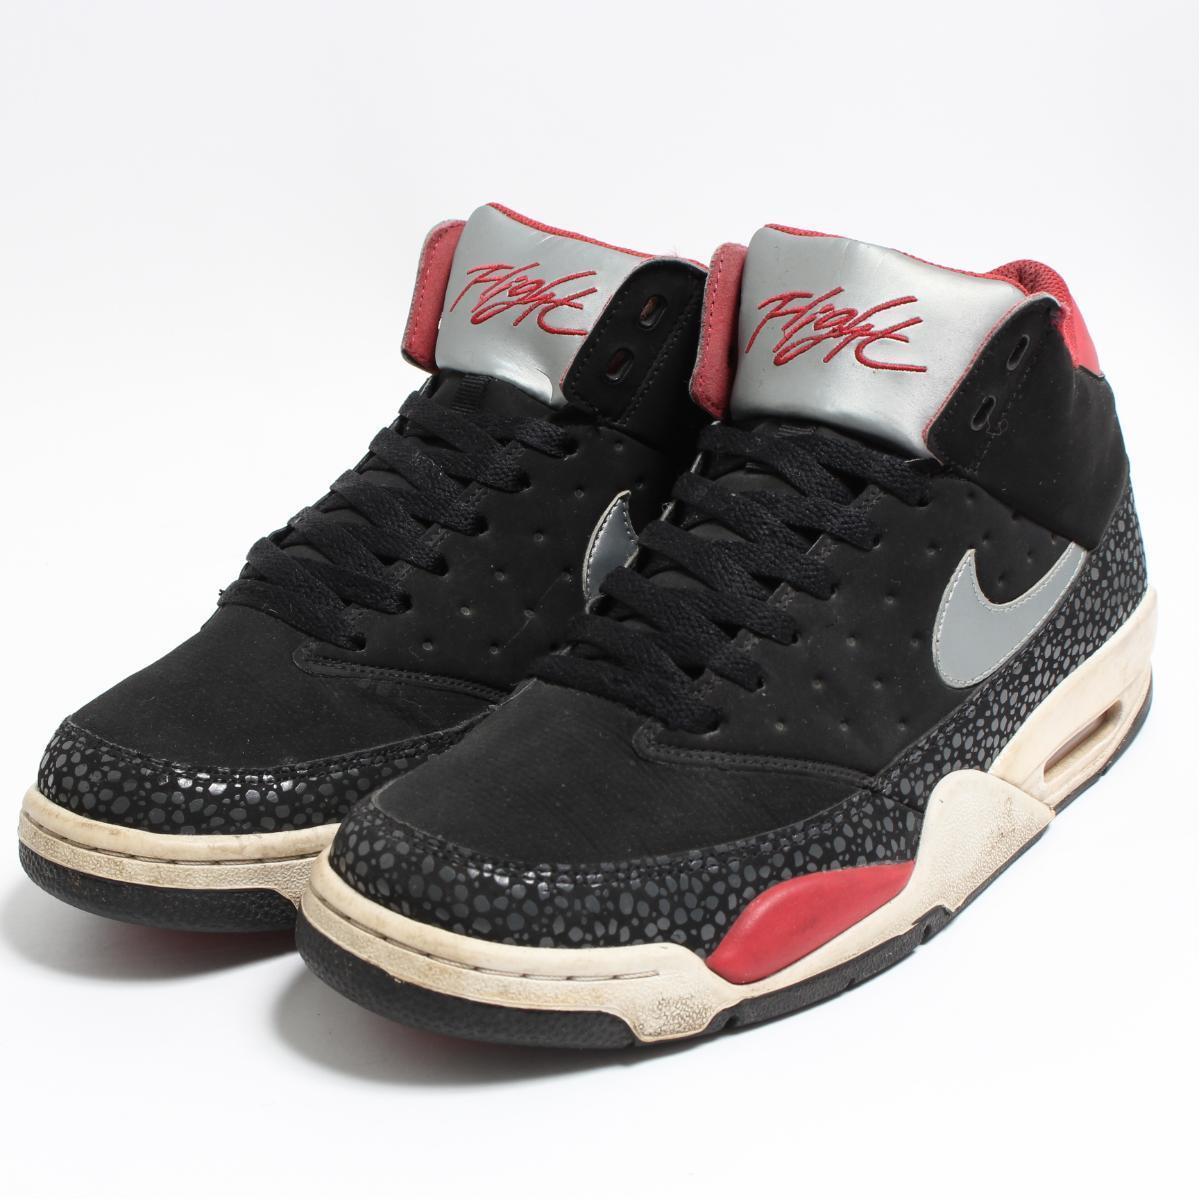 multiple colors 6d7f9 6e318 ... cheapest nike nike air flight classic sneakers us8 .5 mens 26.5cm  bon5873 46800 4de3a